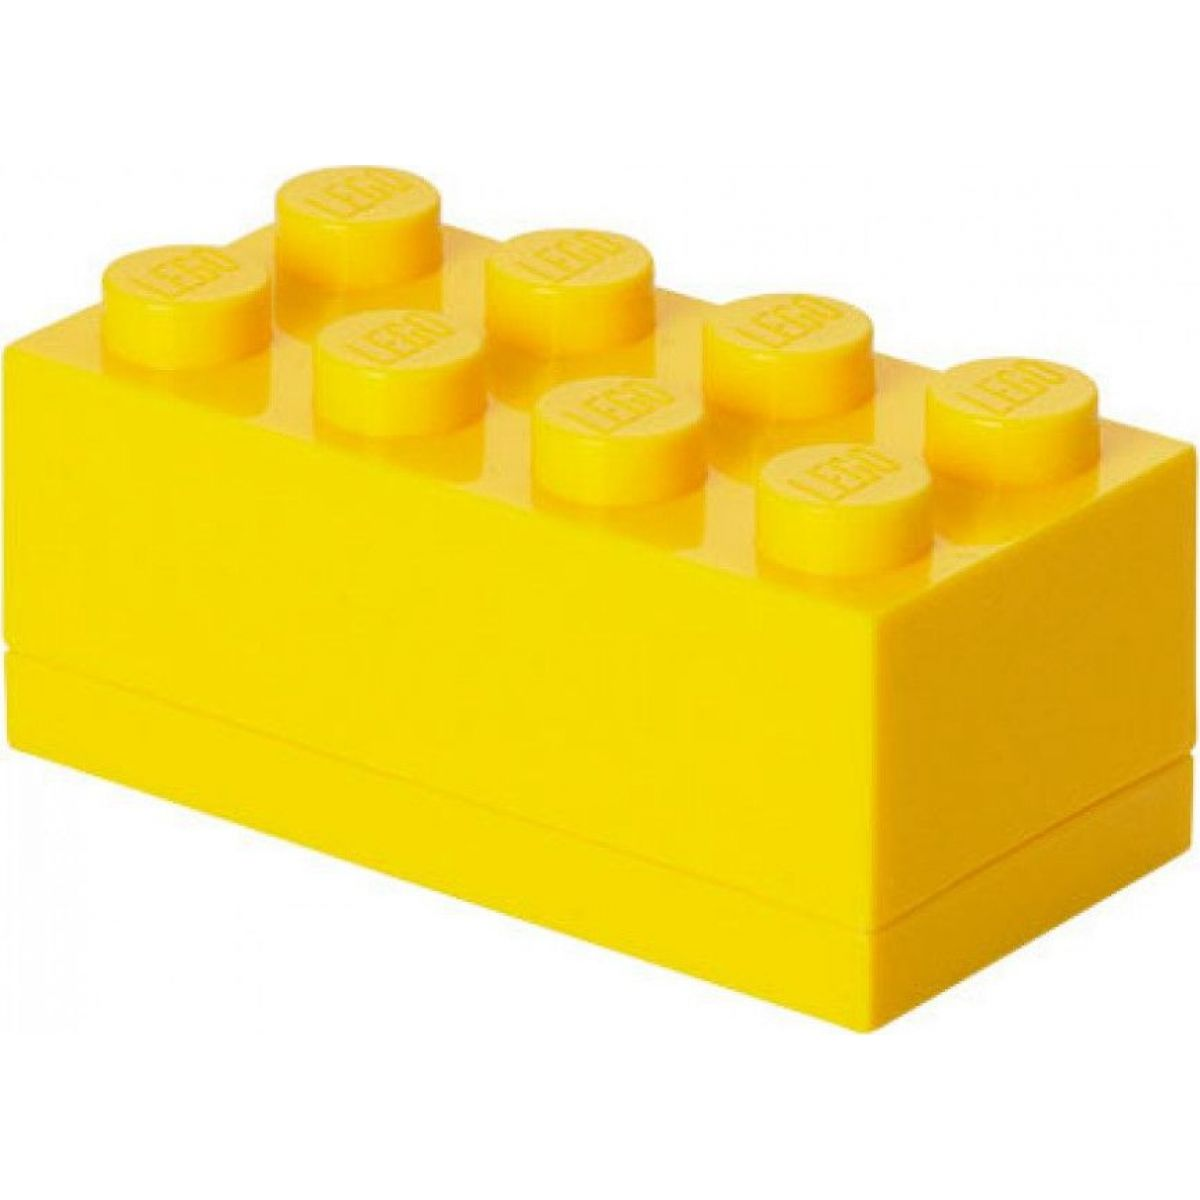 LEGO Mini Box 4,6 x 9,3 x 4,3 cm žltý